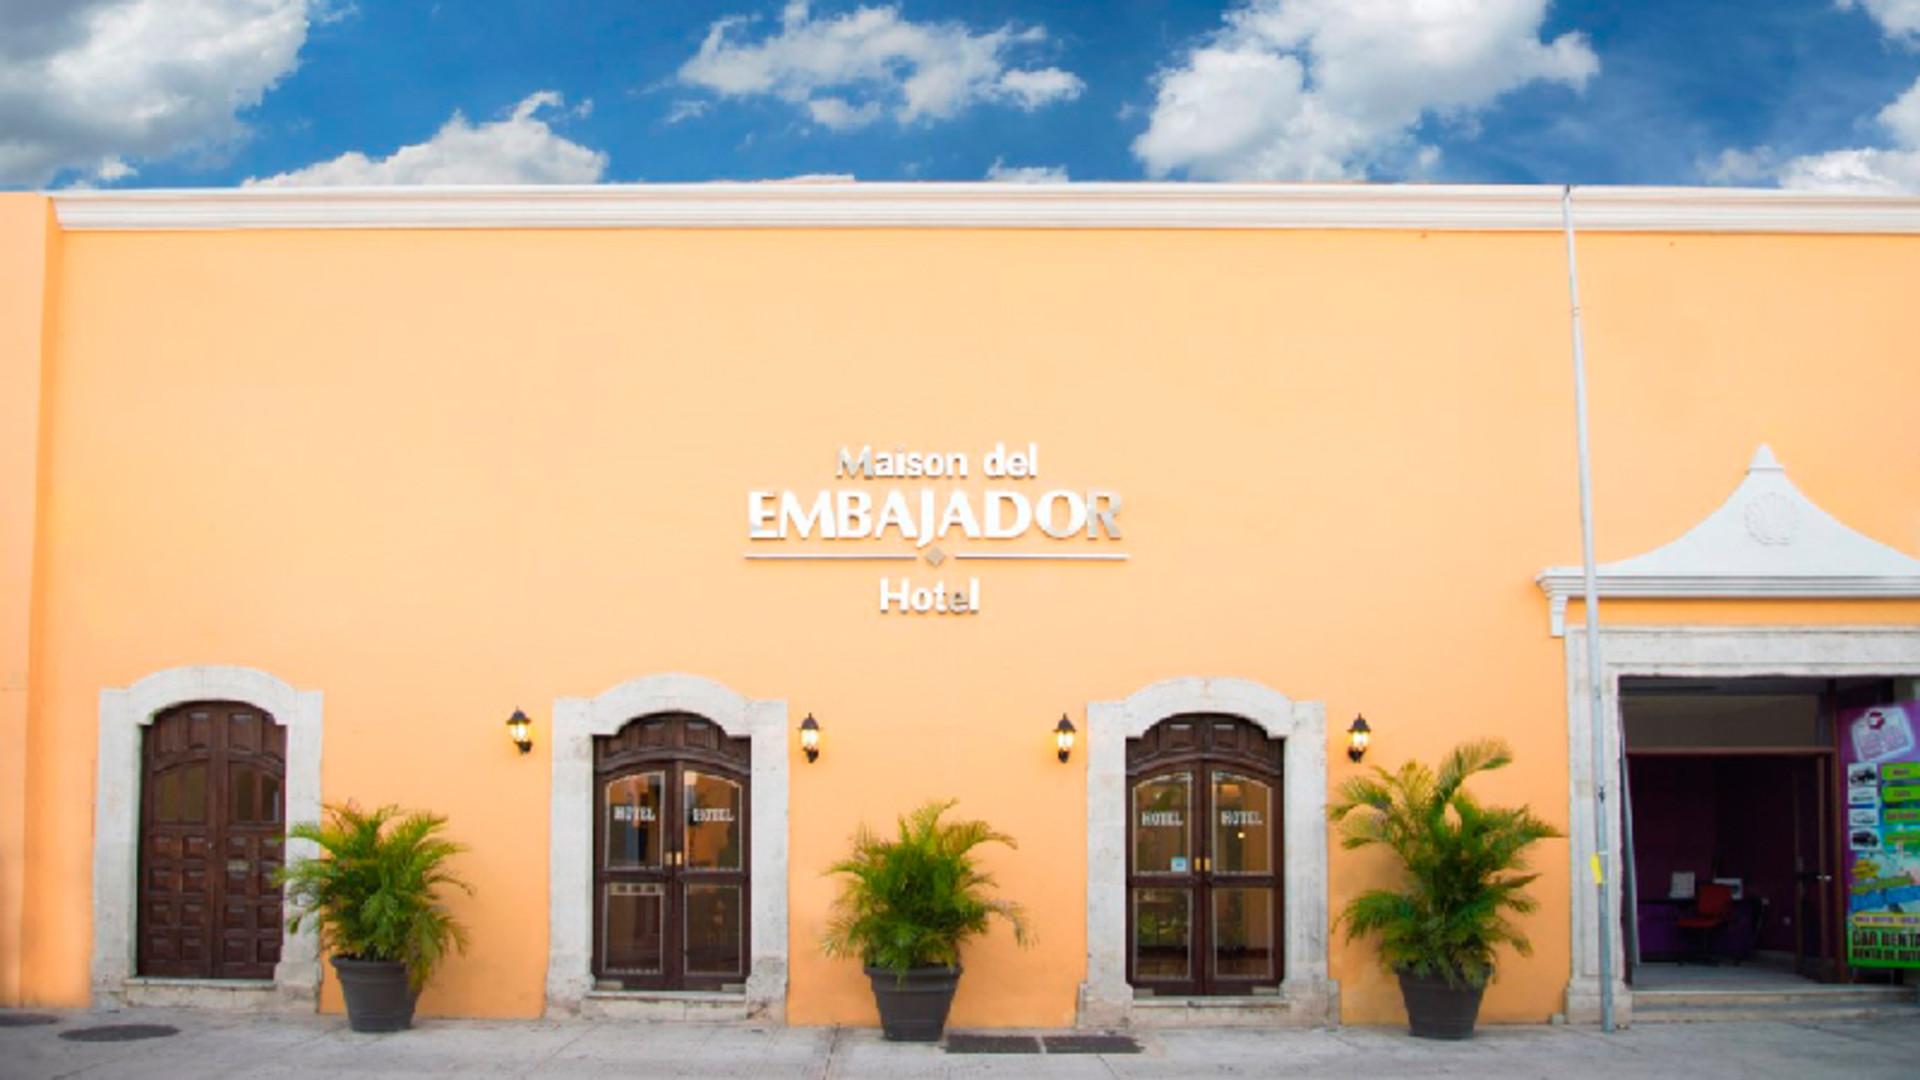 Maison del Embajador